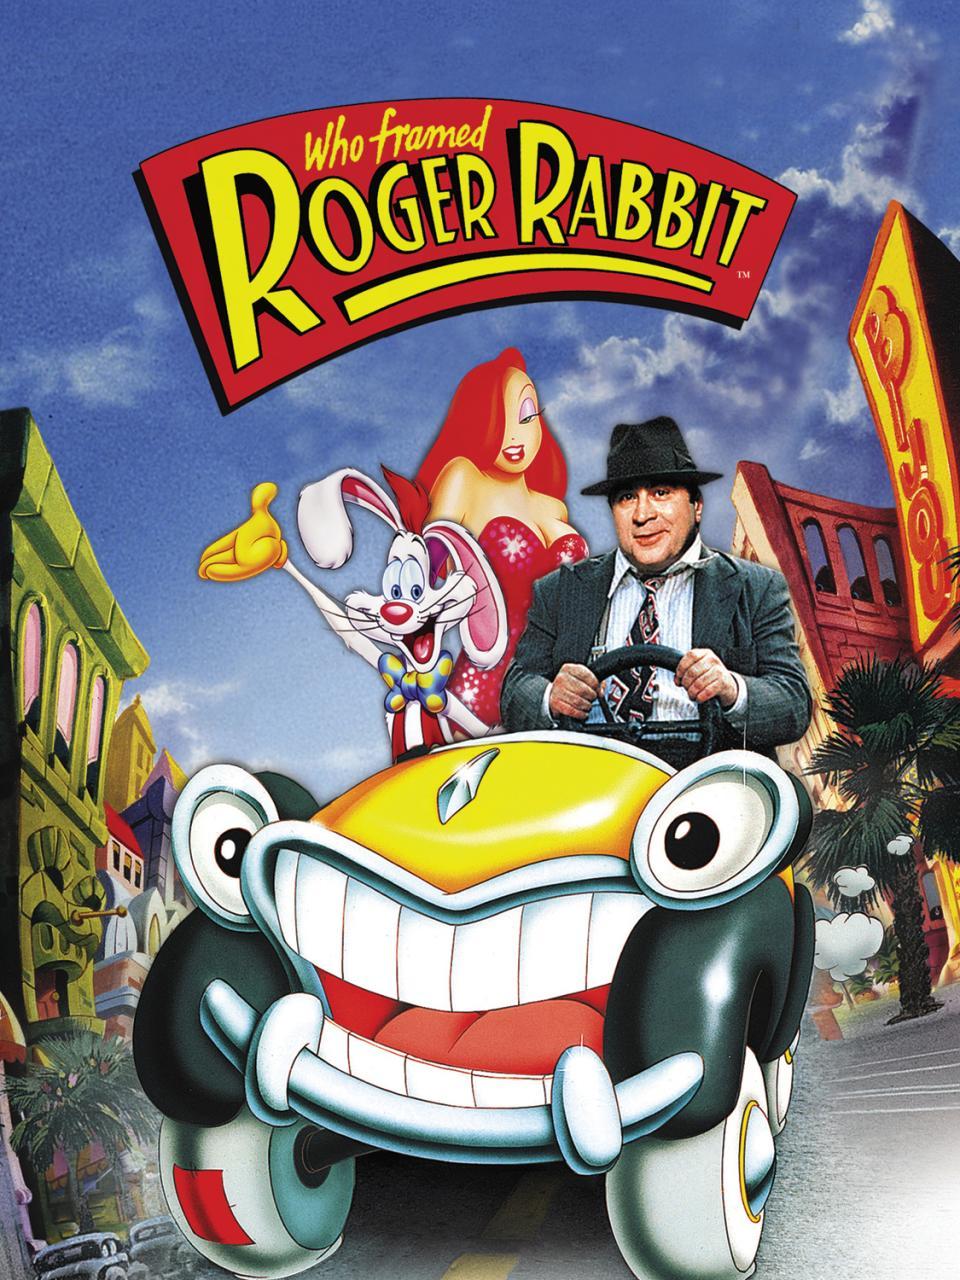 Descargar ¿Quien Engaño a Roger Rabbit? 1998 BrRip latino (Mega)